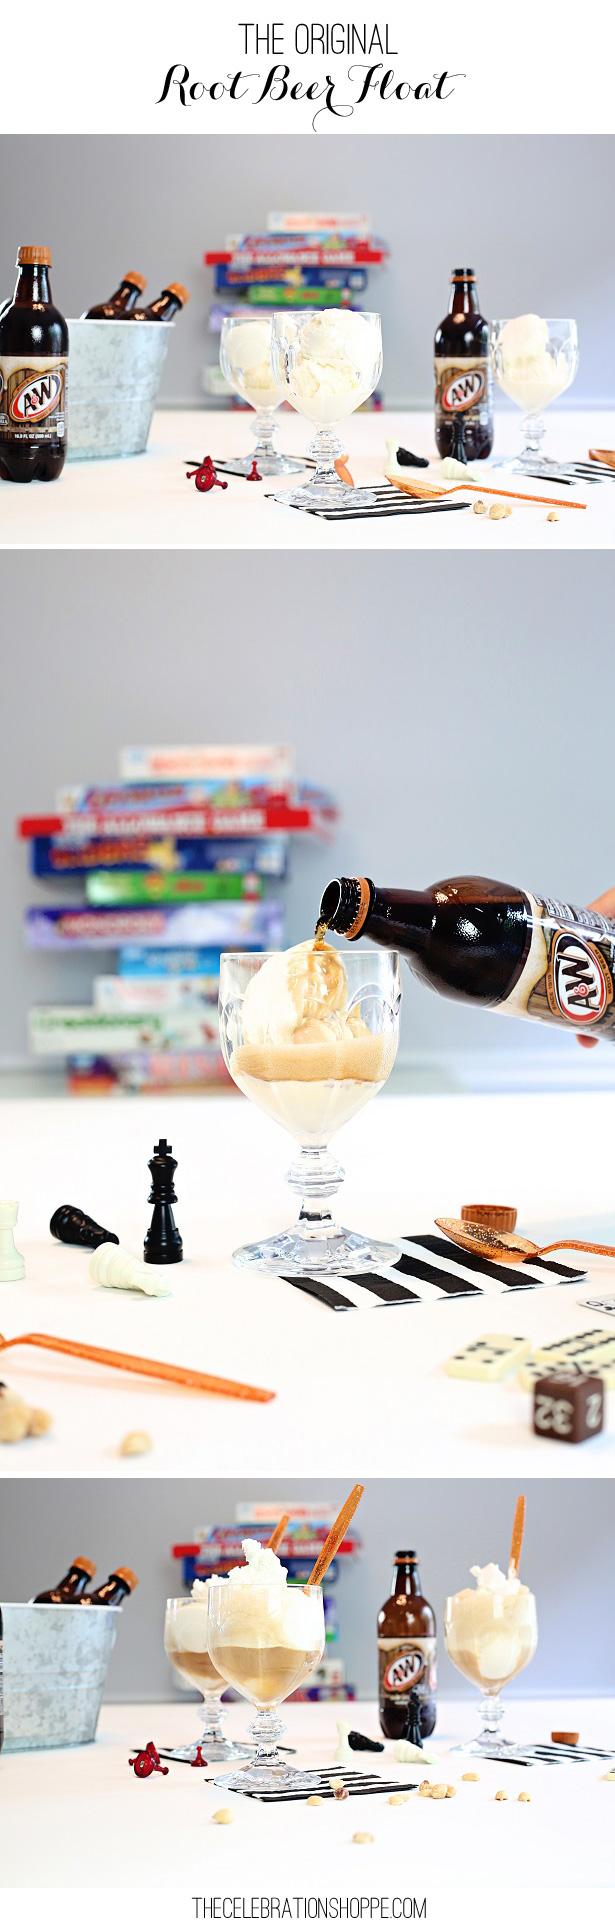 Original Root Beer Float | Kim Byers